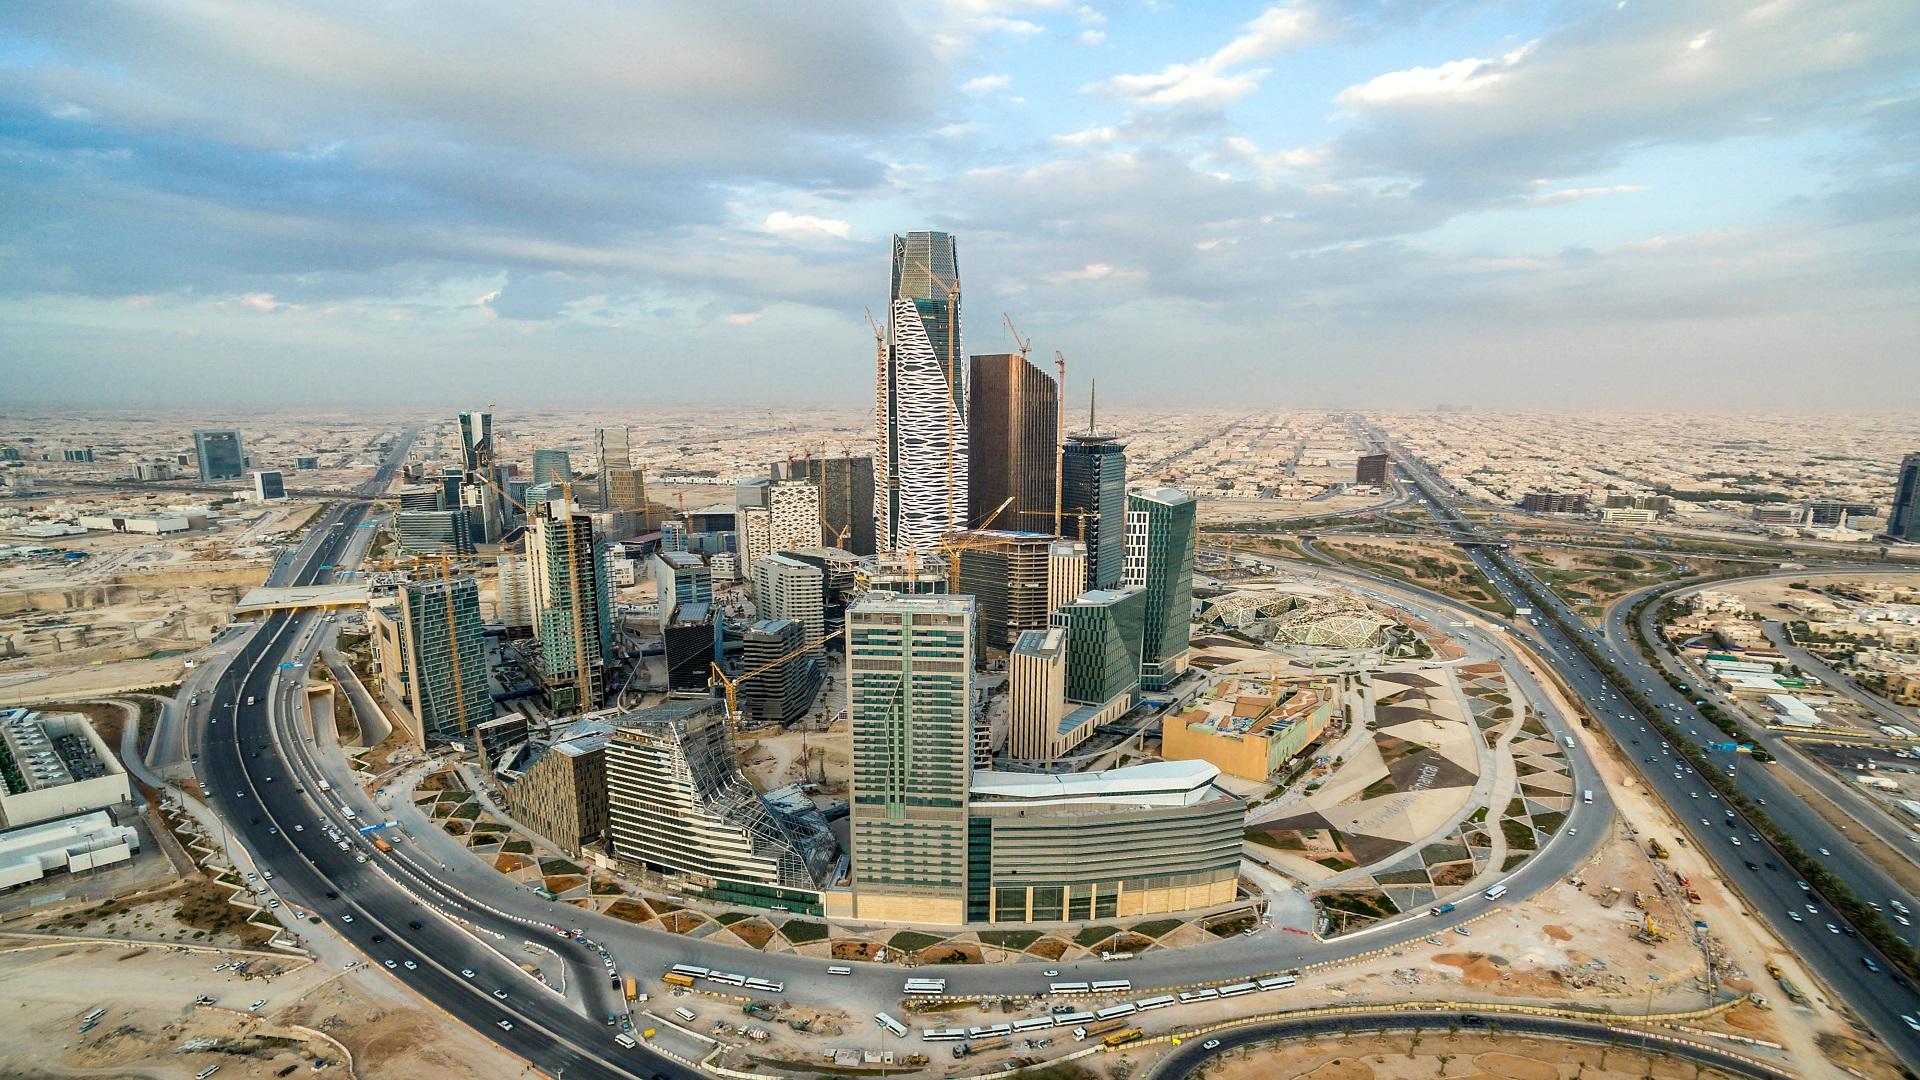 Riyadh city skyline, Saudi Arabia